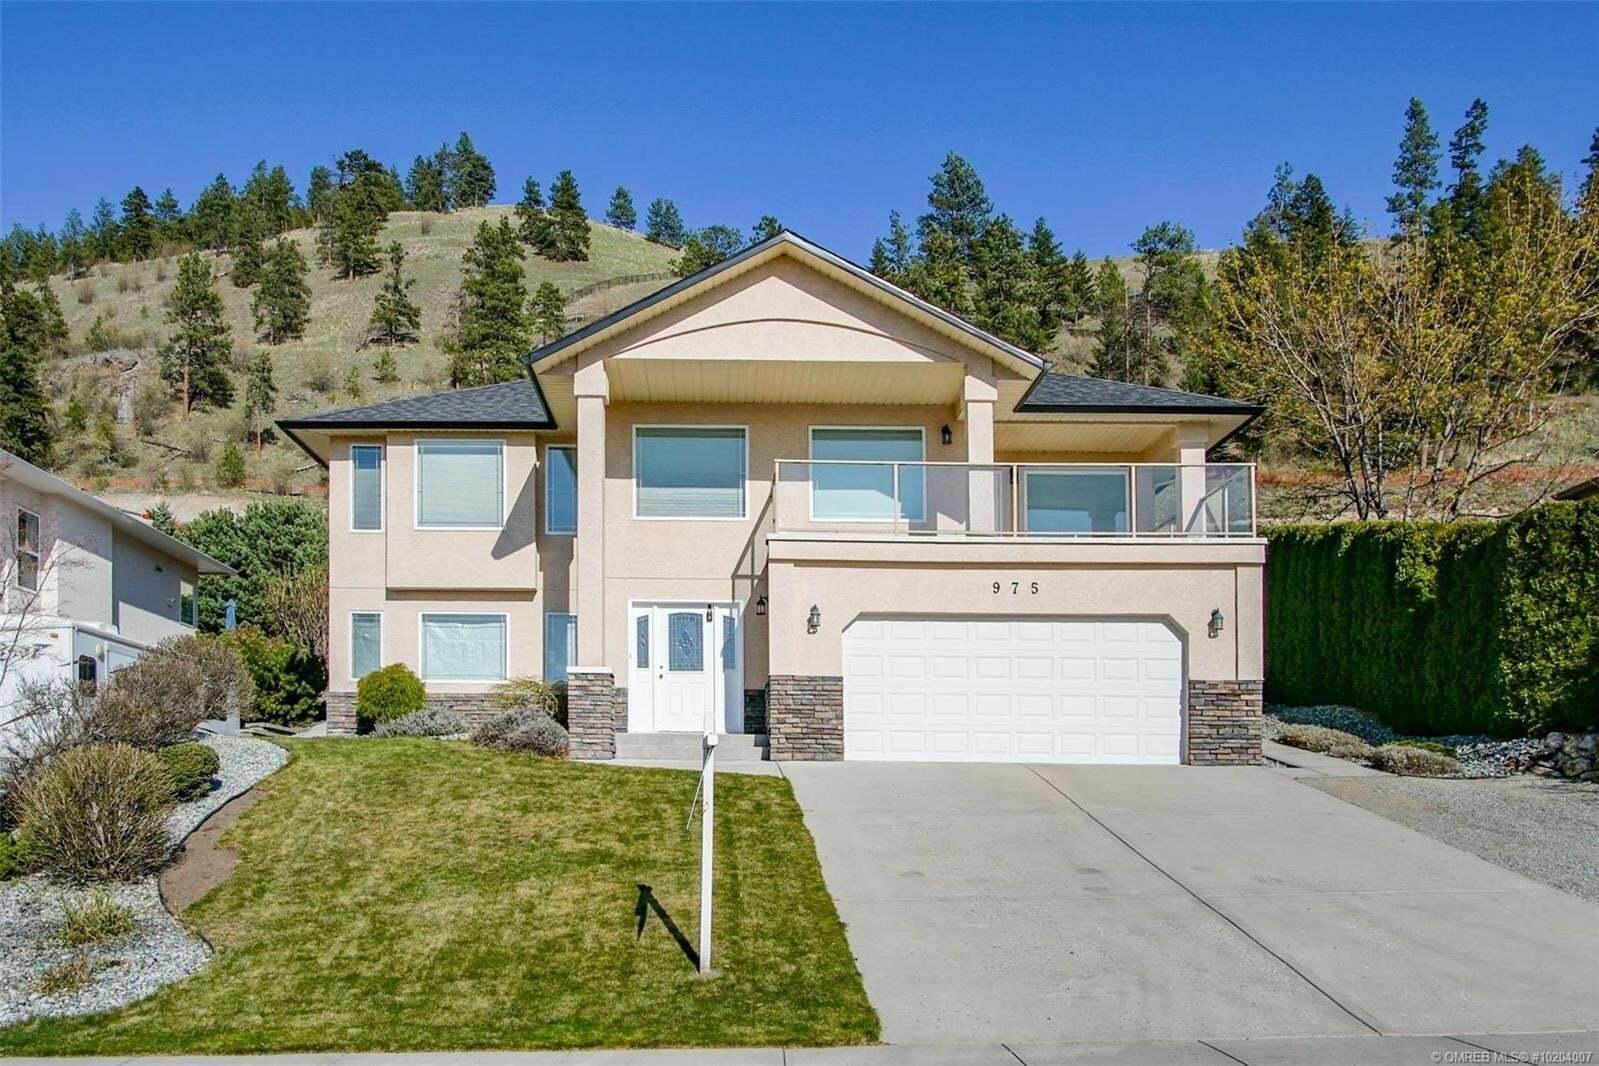 House for sale at 975 Lone Pine Dr Kelowna British Columbia - MLS: 10204007